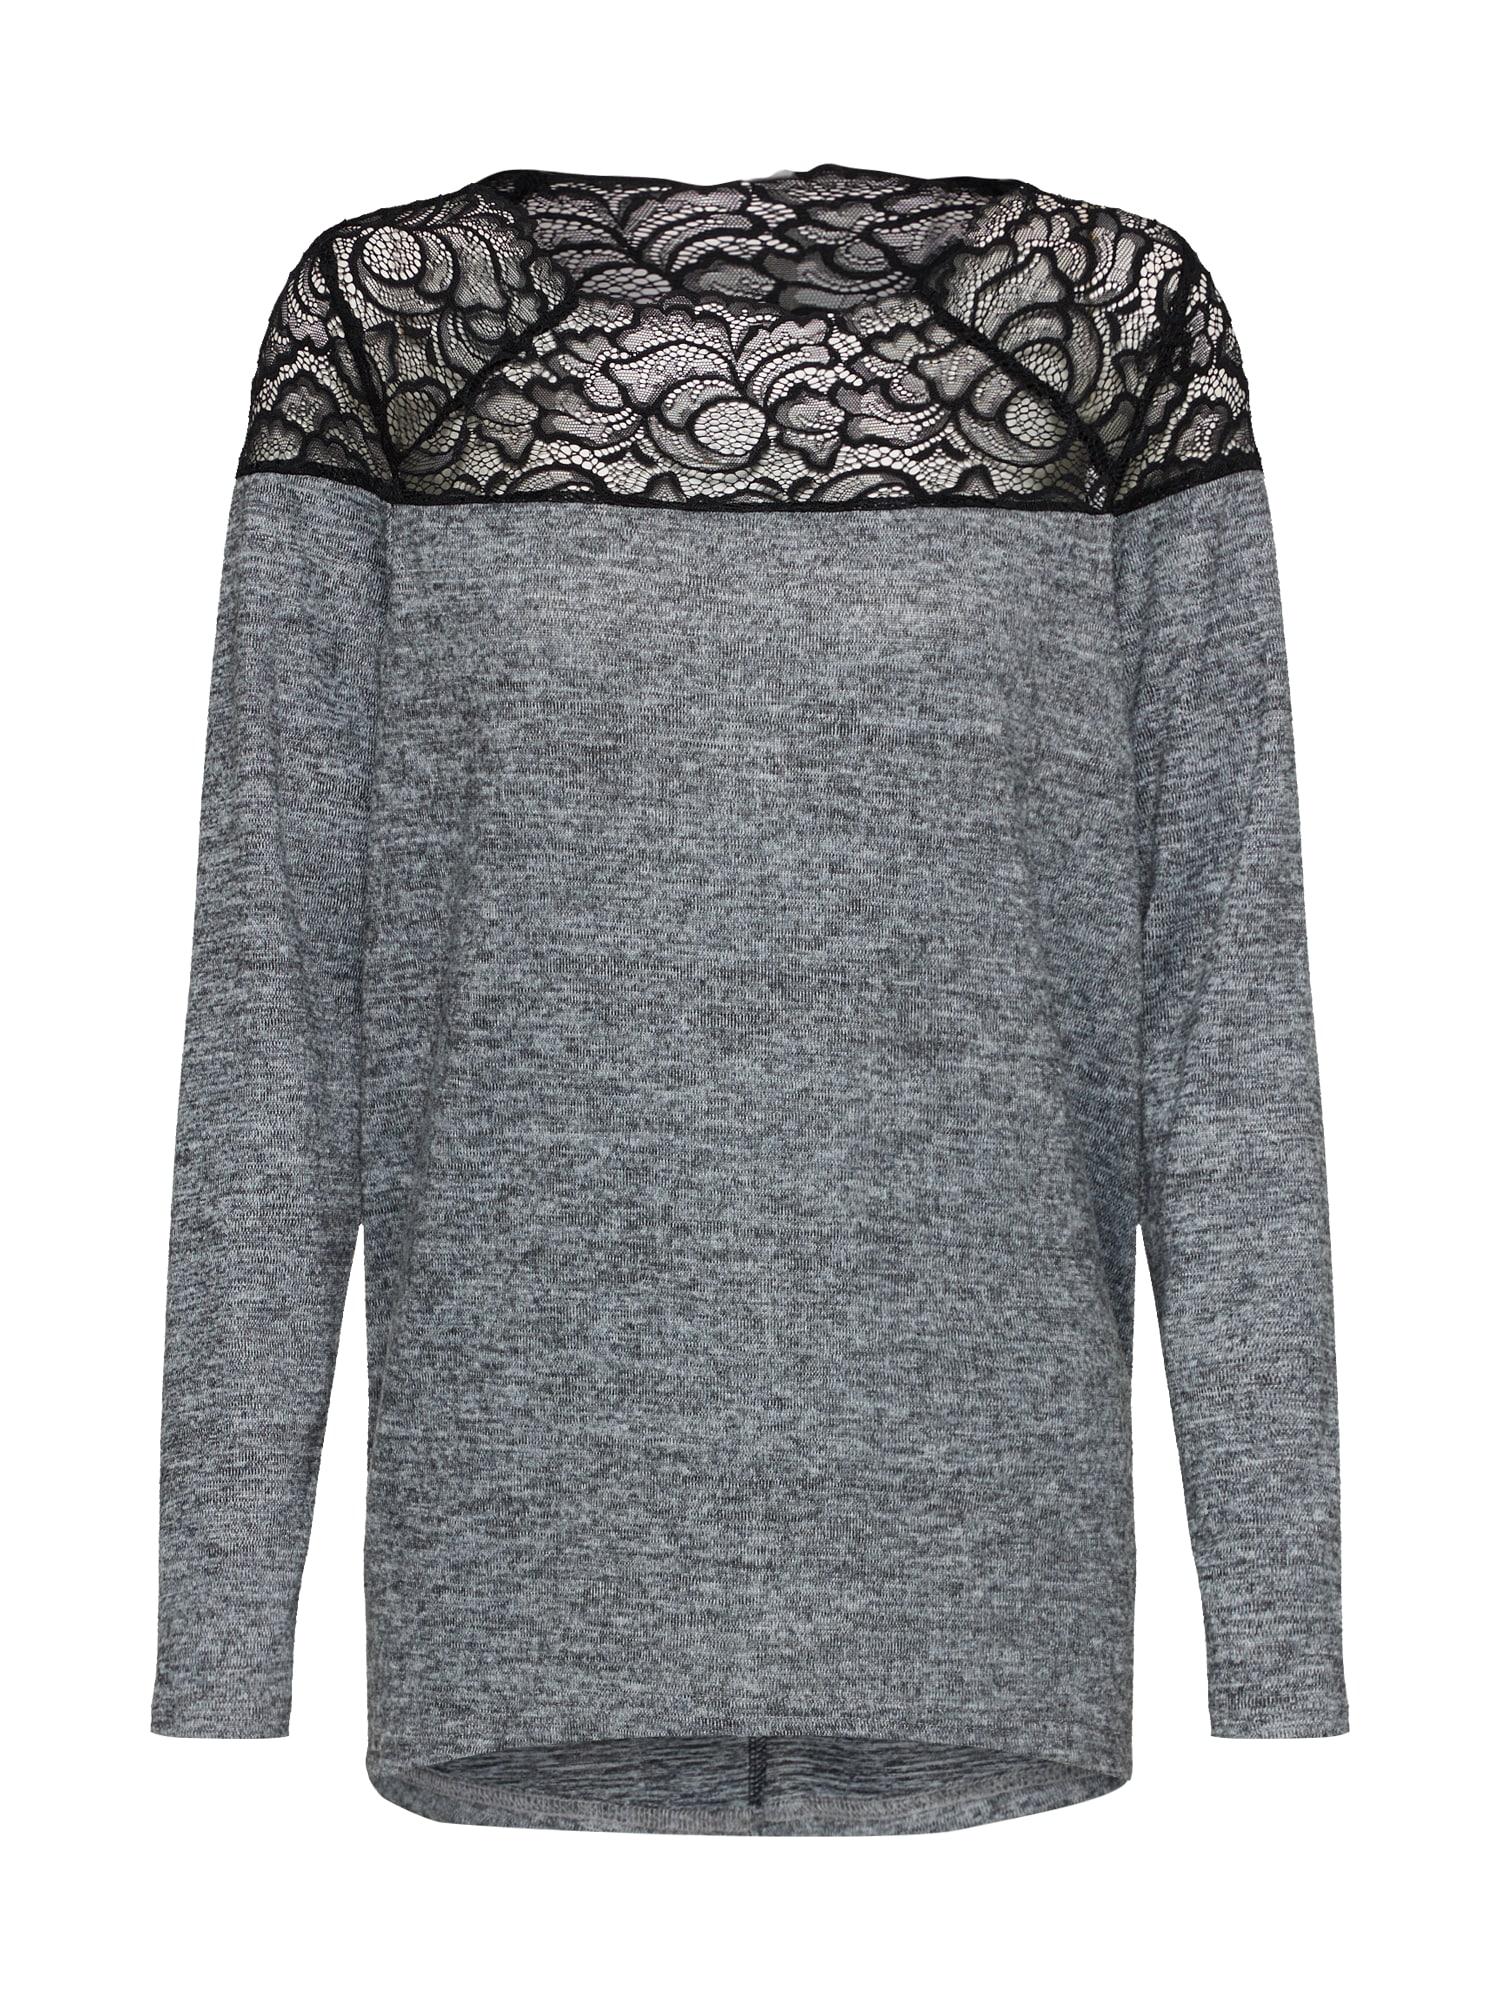 Dlouhé svetry